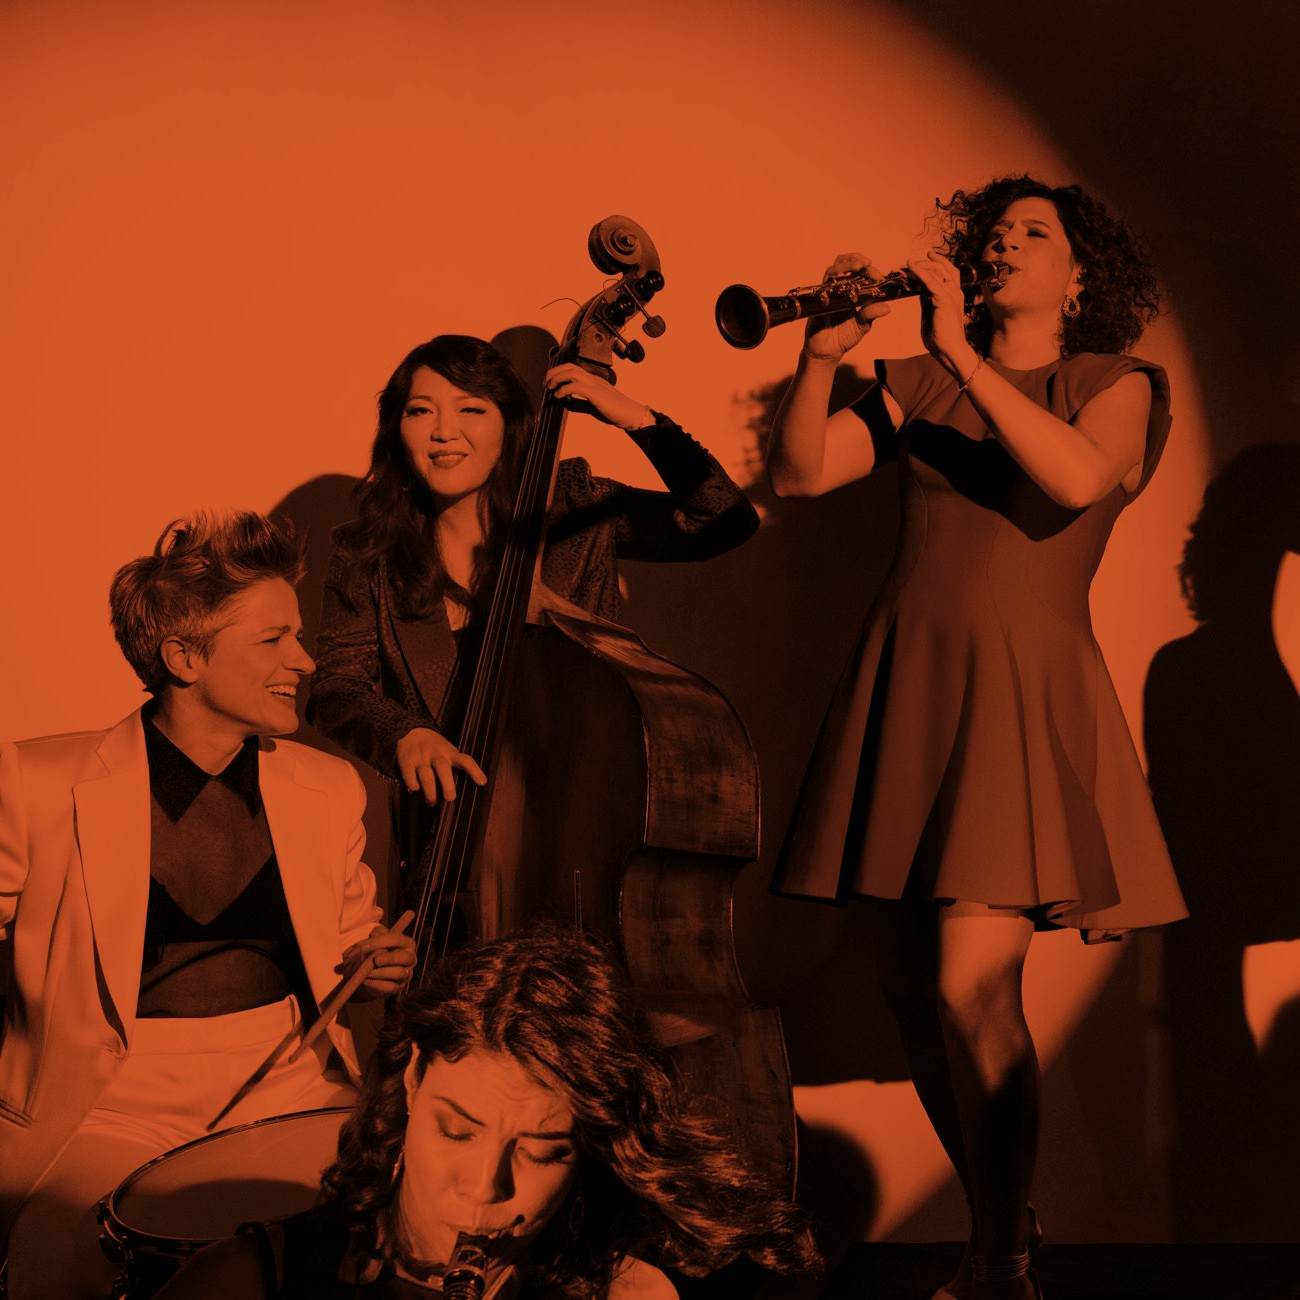 Caption: Members of Artemis – Allison Miller, Melissa Aldana, Noriko Ueda, Anat Cohen